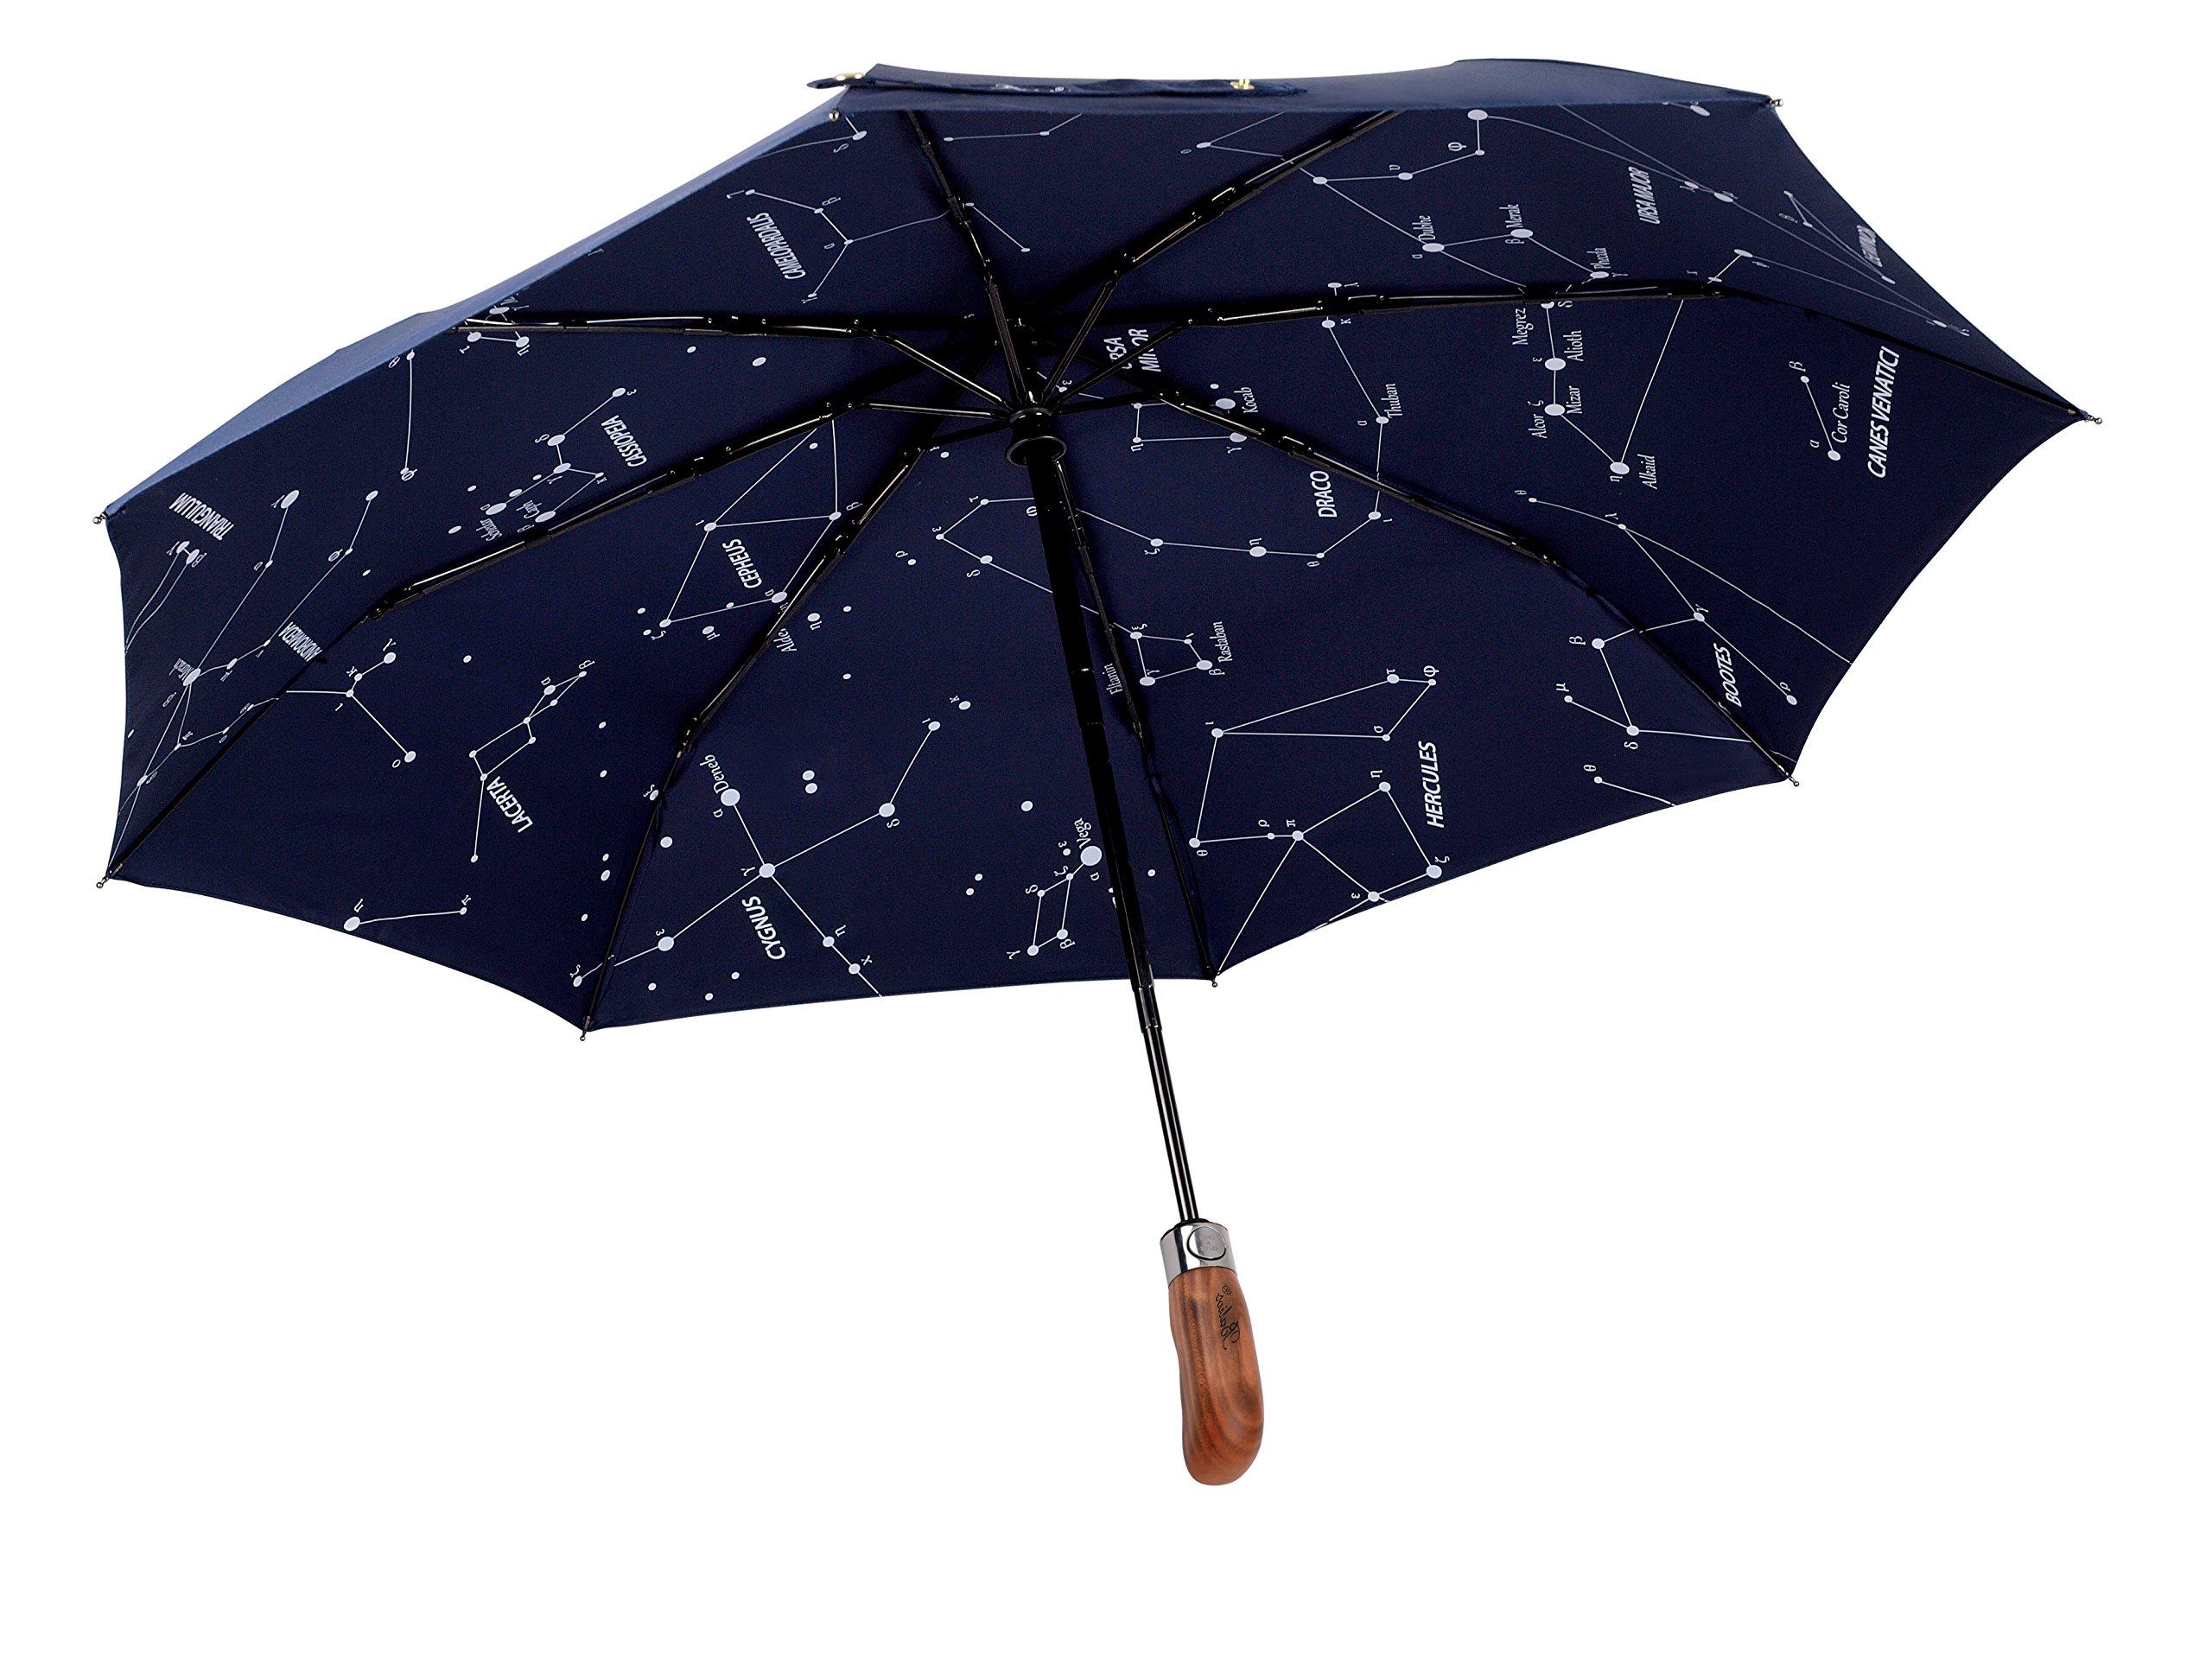 Balios (Designed in UK) Umbrella Handmade Real Wood Handle-Dark Navy with Sophisticated Constellation Interior Pattern-Windproof Fiberglass Auto Open Close Folding-300T Finest Fabric-Luxury Gift Box